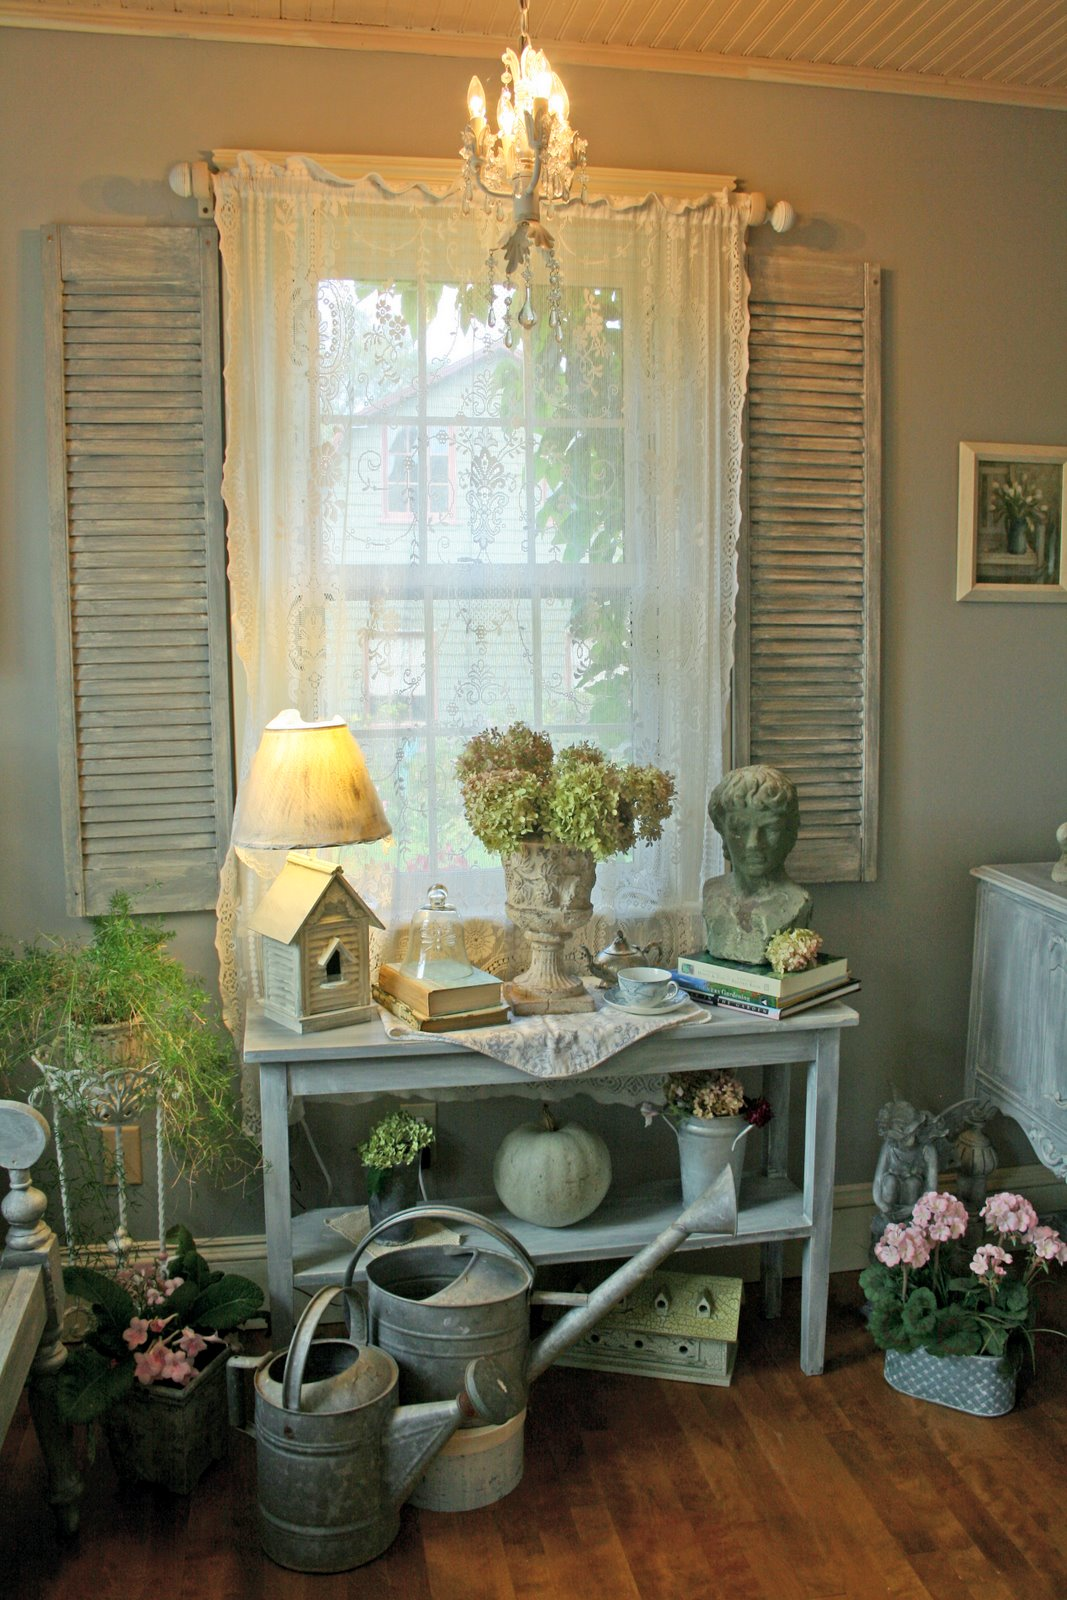 aiken house gardens a garden room theme. Black Bedroom Furniture Sets. Home Design Ideas